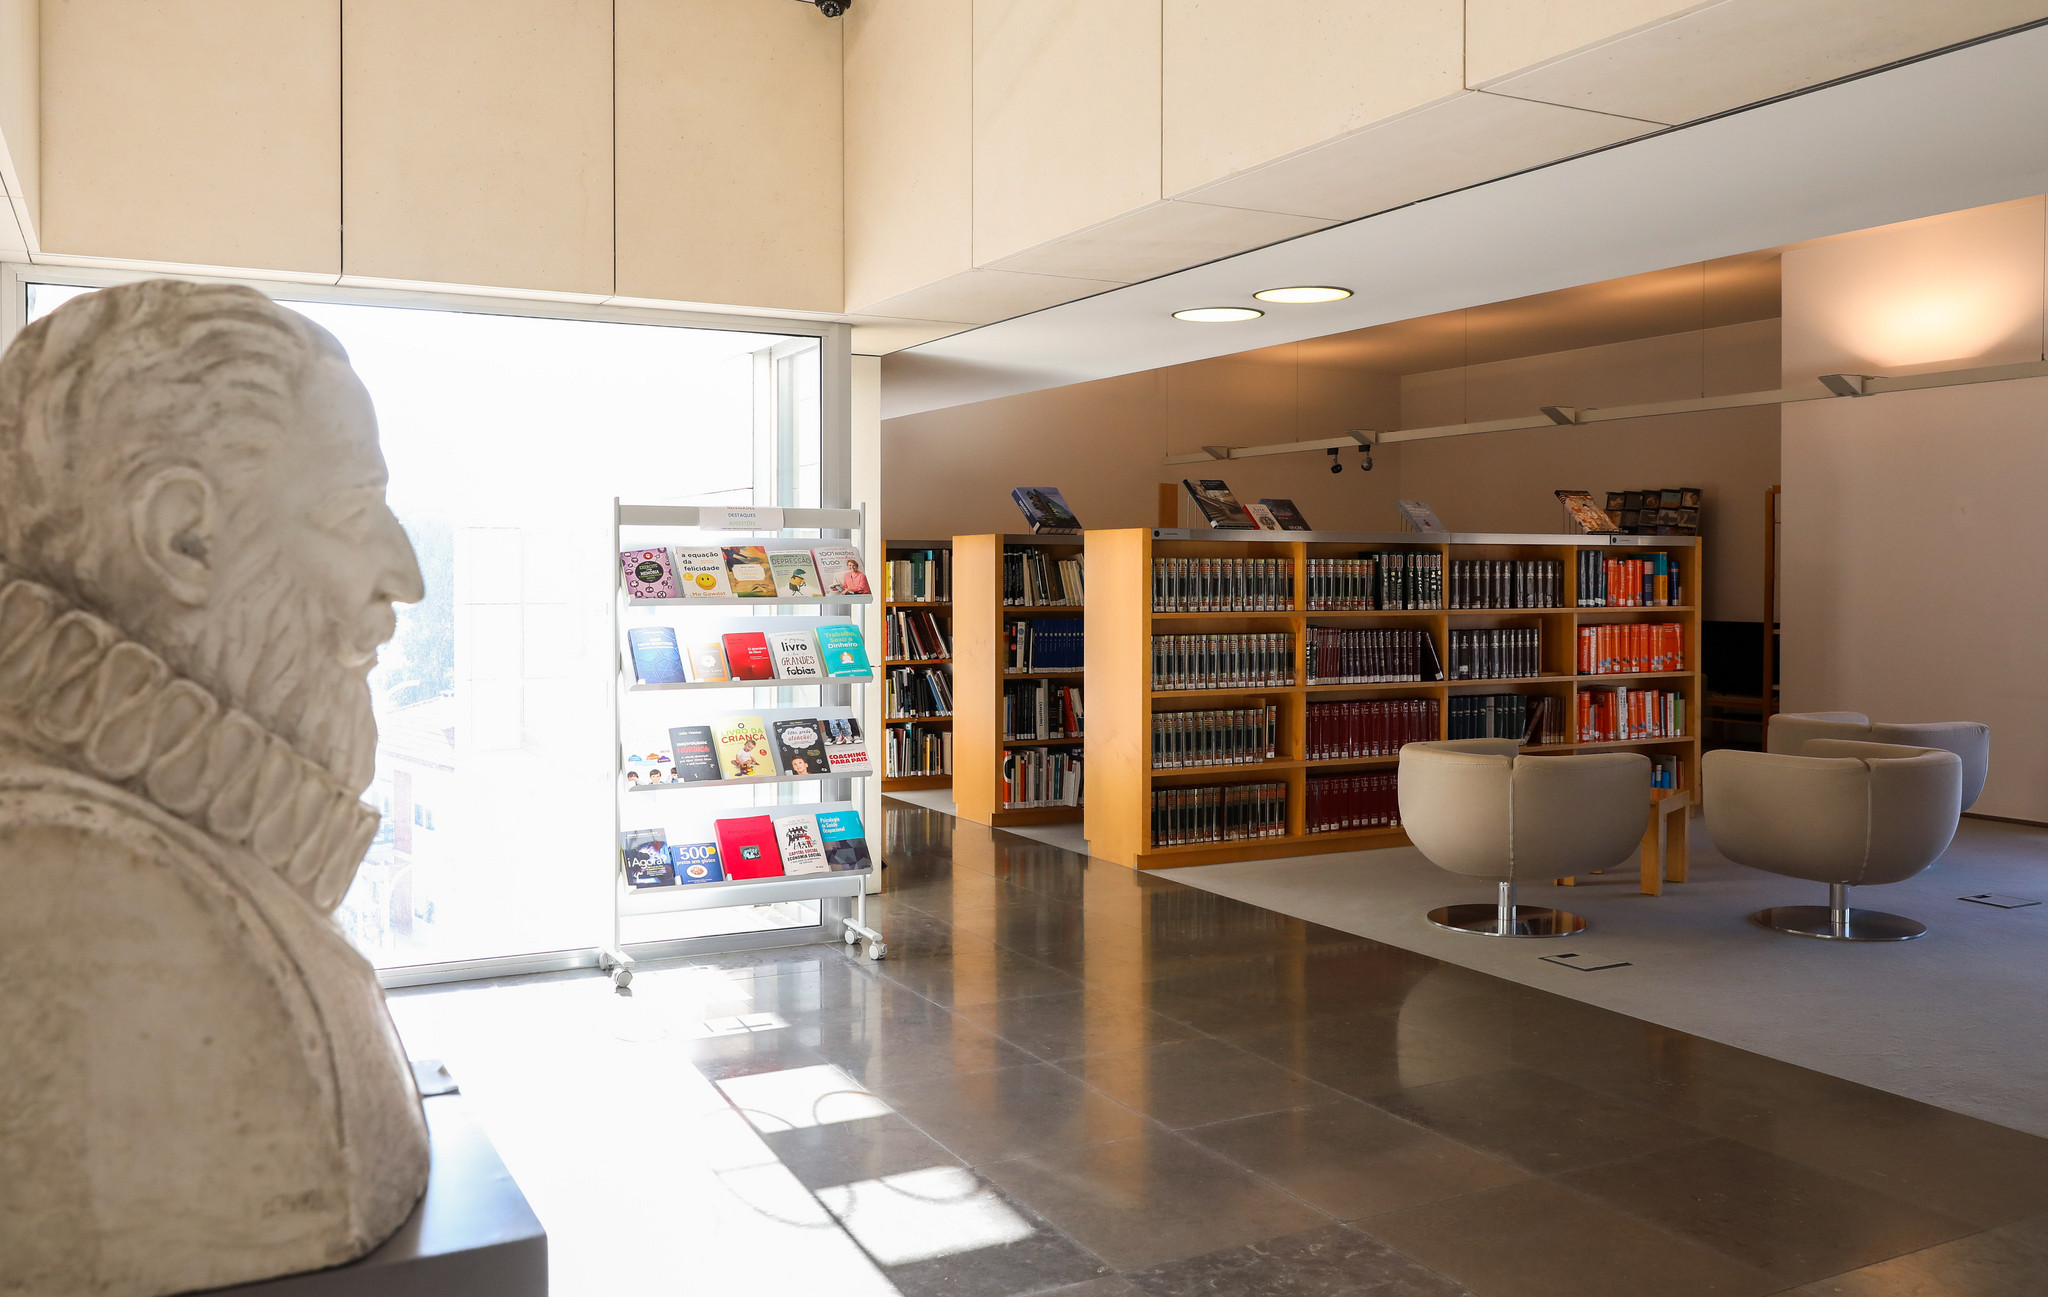 LM-Biblioteca Florbela Espanca 03-01-19-14.jpg